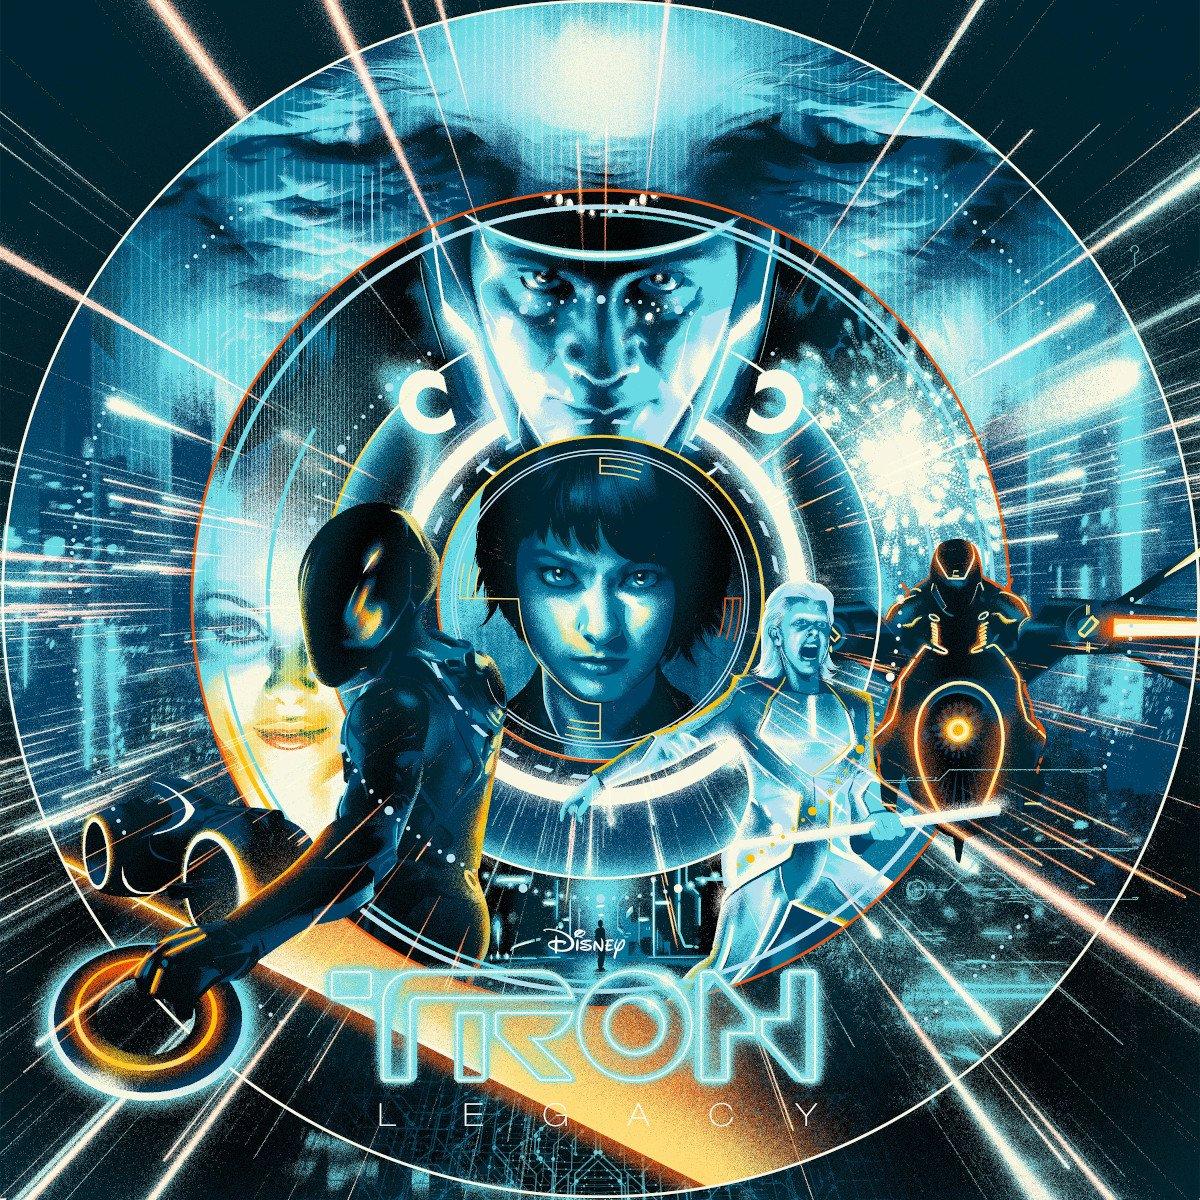 daft punk tron legacy soundtrack score deluxe vinyl reissue mondo cover